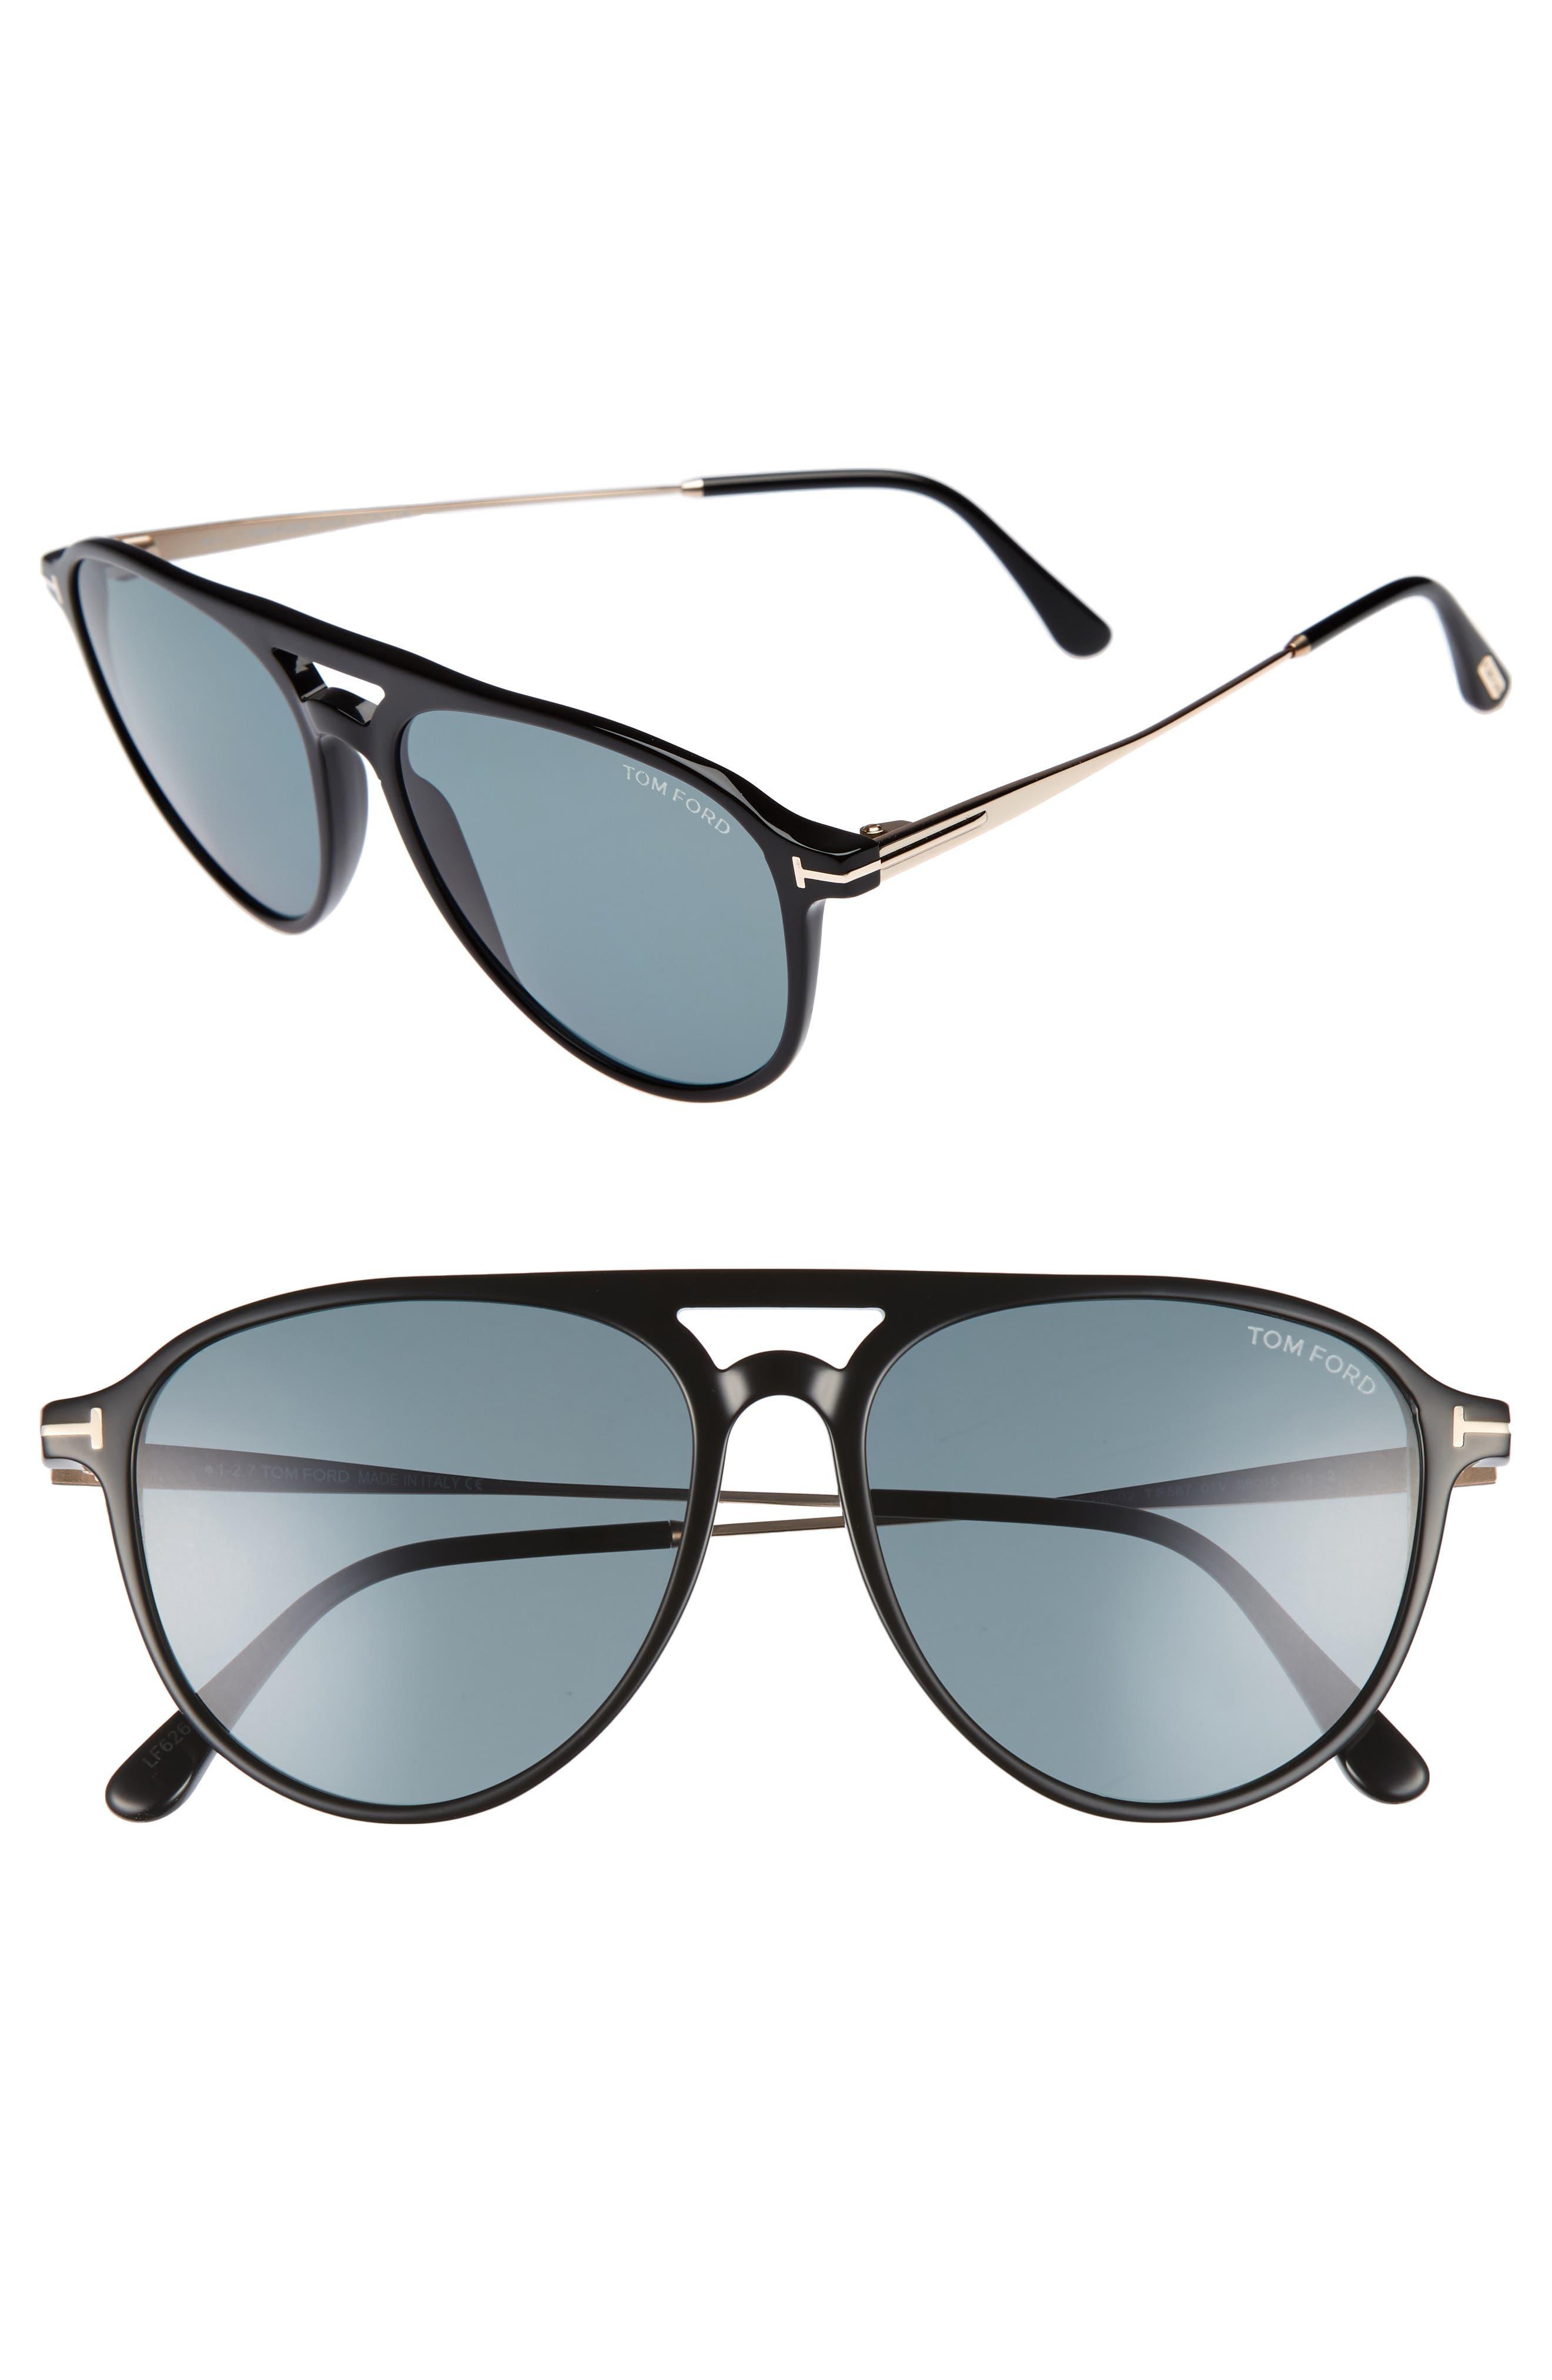 Carlo 59mm Aviator Sunglasses,                         Main,                         color,